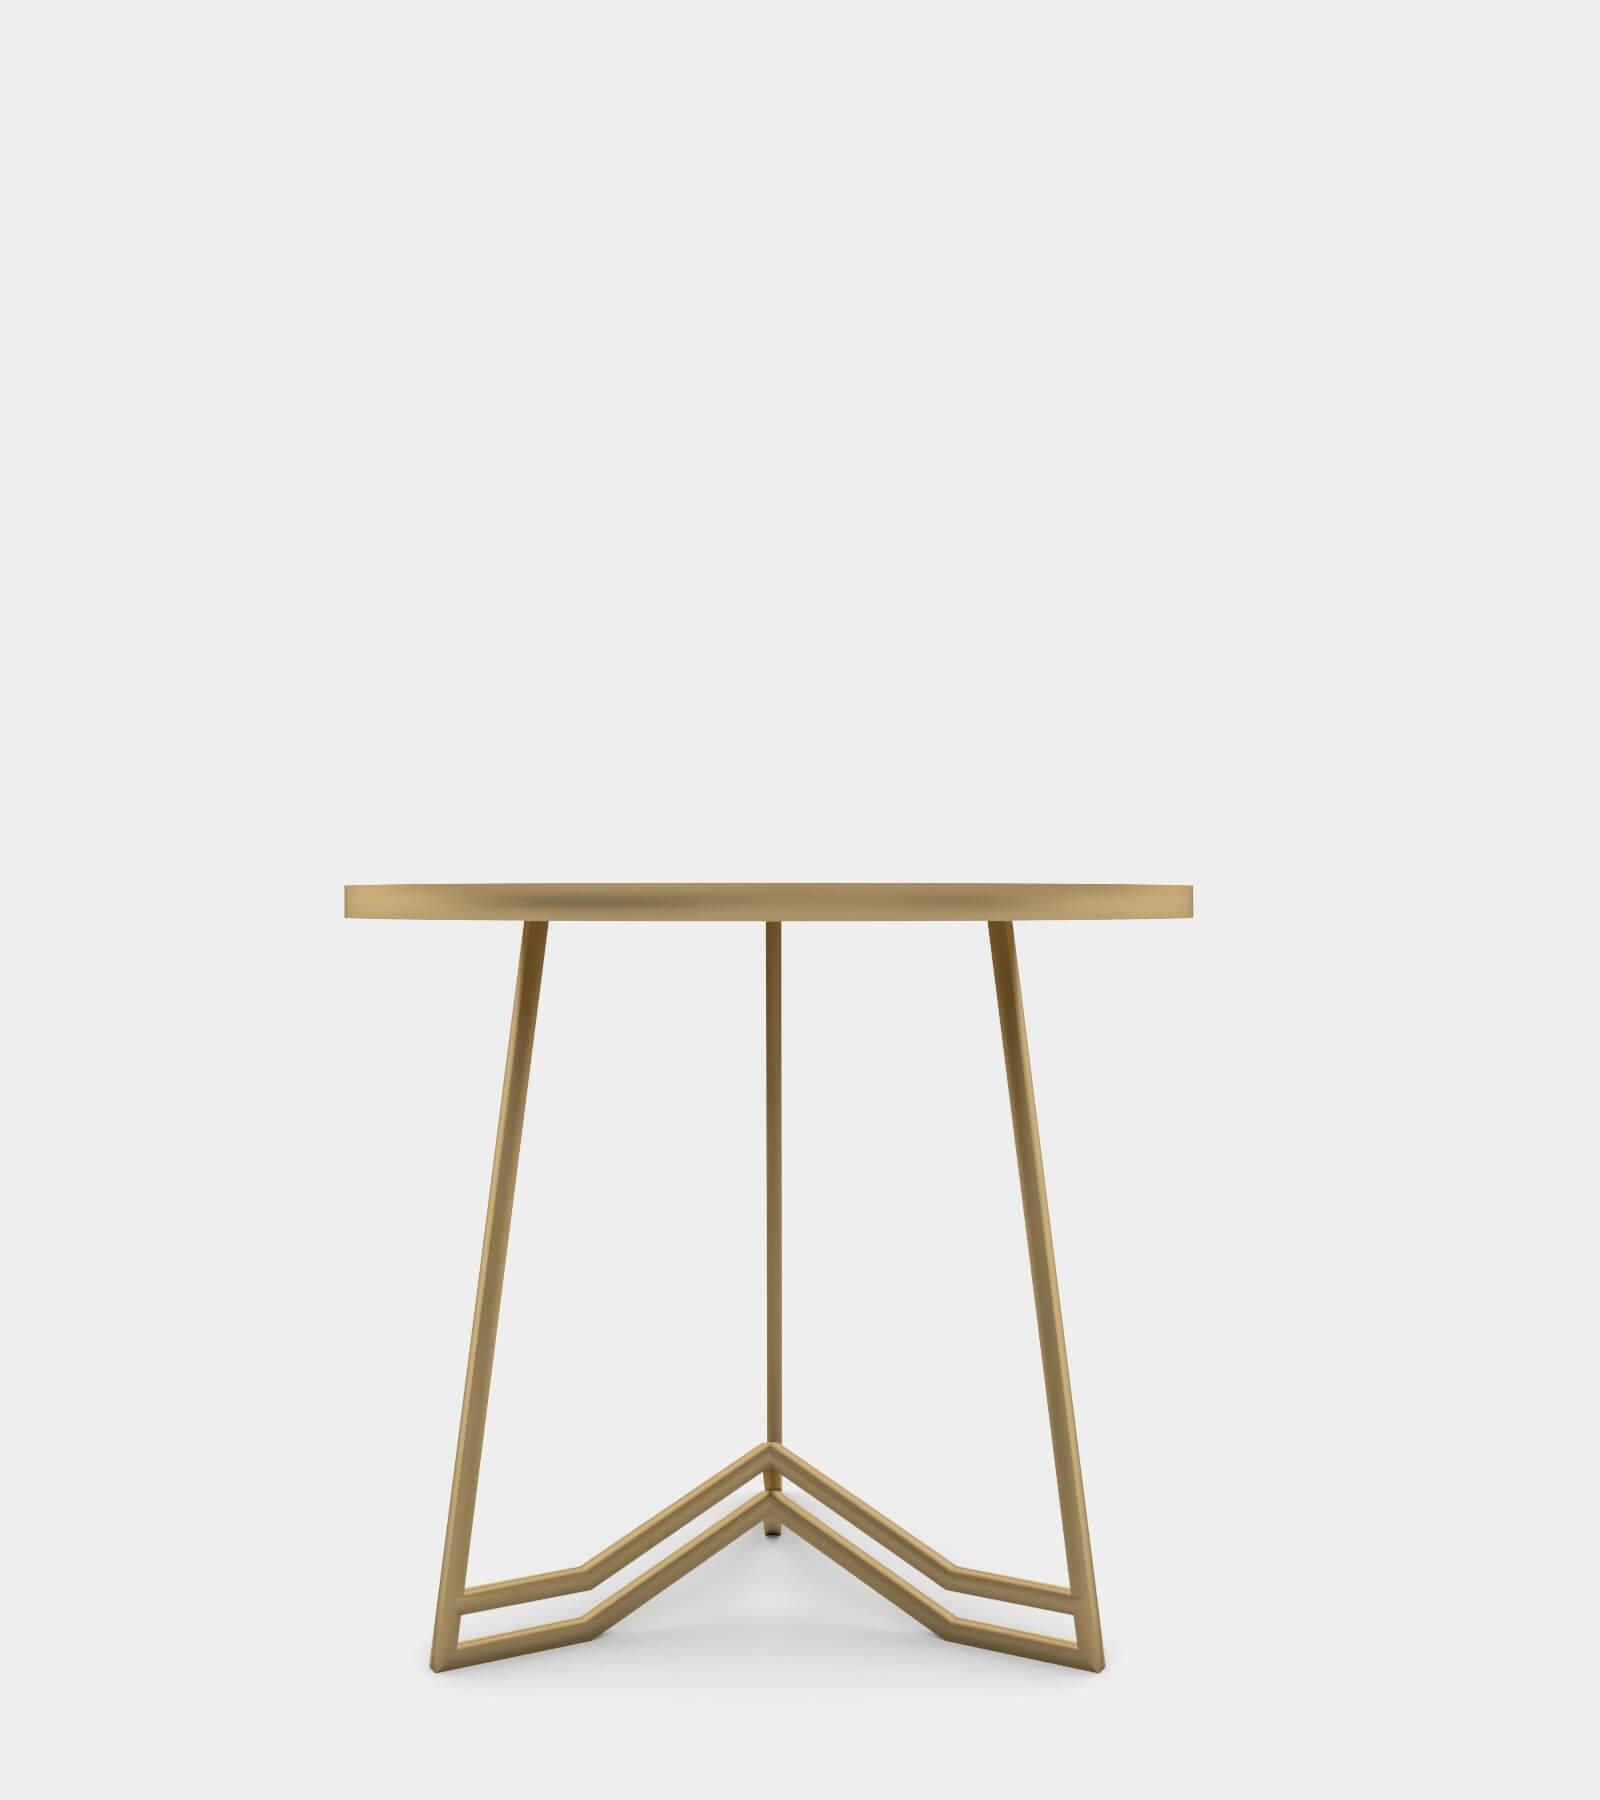 Bronze side table 2 - 3D Model